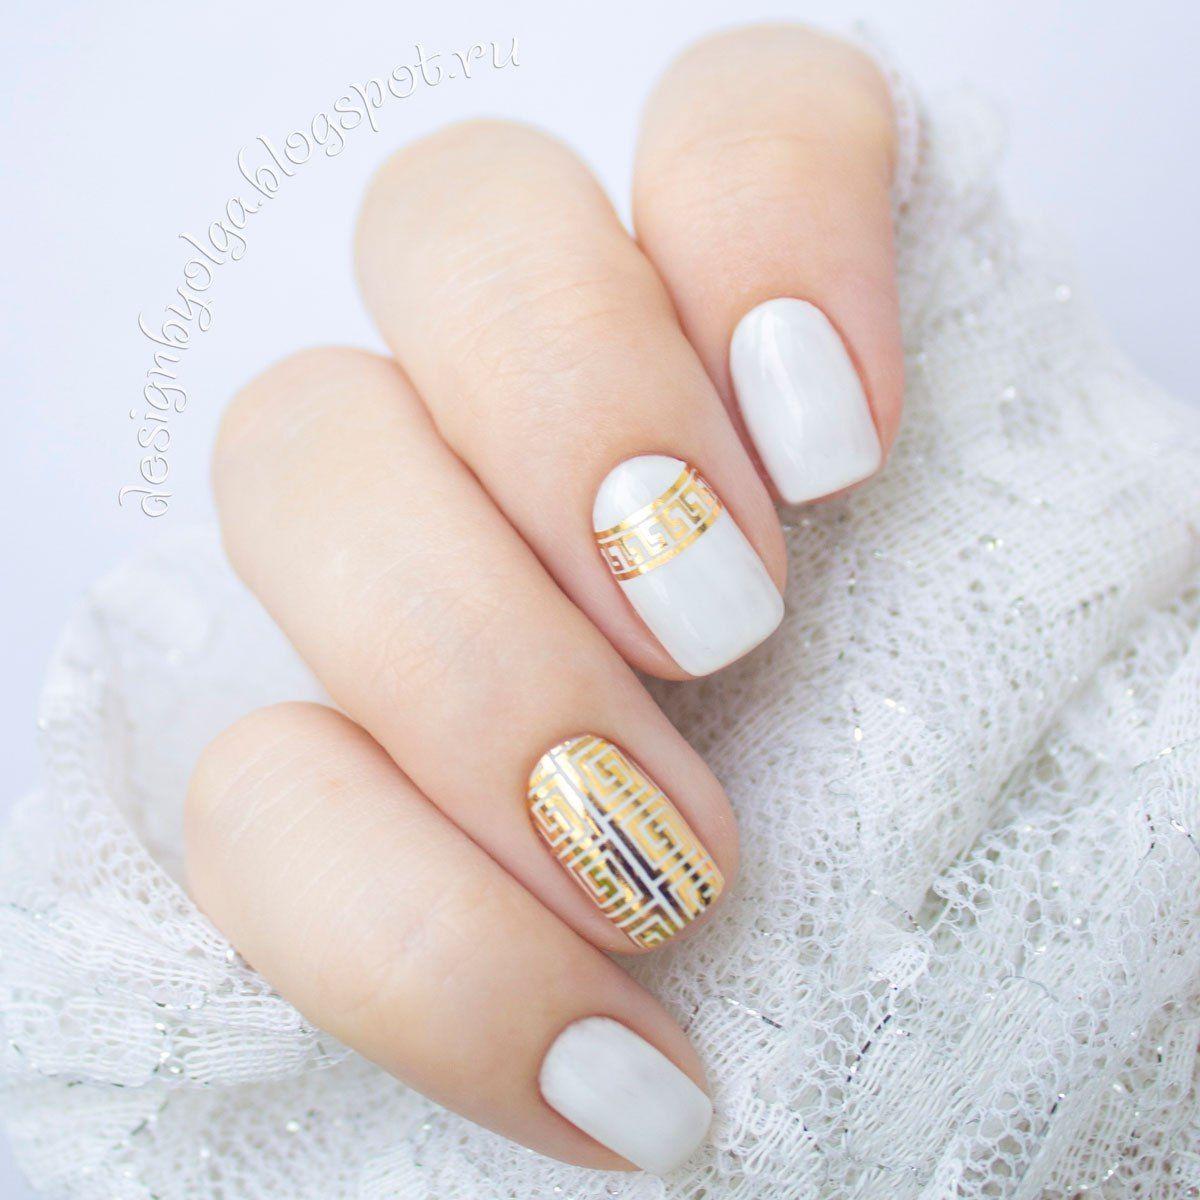 nail decals, nail stickers, nail wraps, foil nails, bpwomen | Nail ...